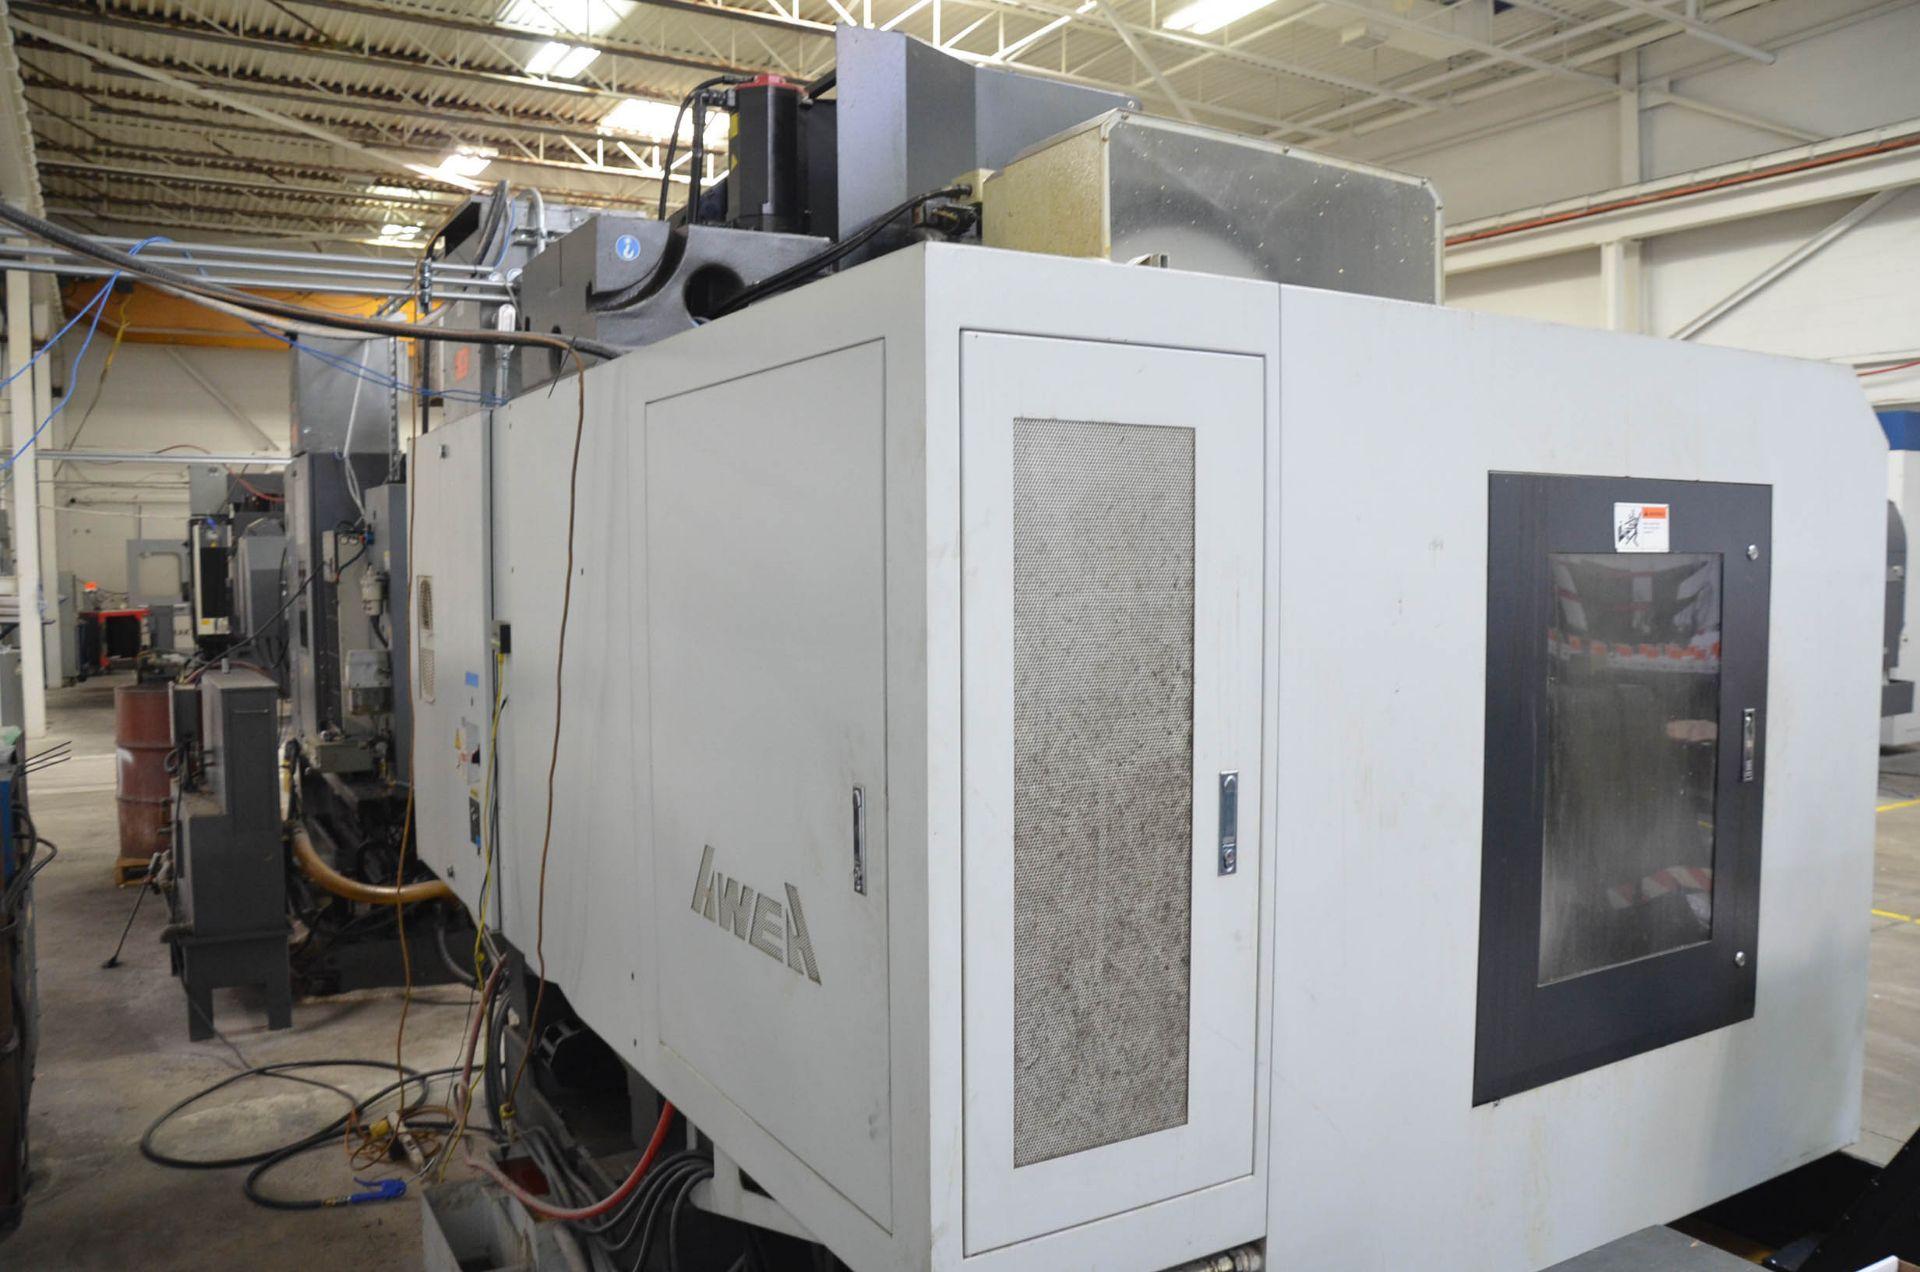 AWEA YAMA SEIKI (2012) AF-1250 CNC VERTICAL MACHINING CENTER WITH FANUC SERIES 31I-MODEL B CNC - Image 10 of 10